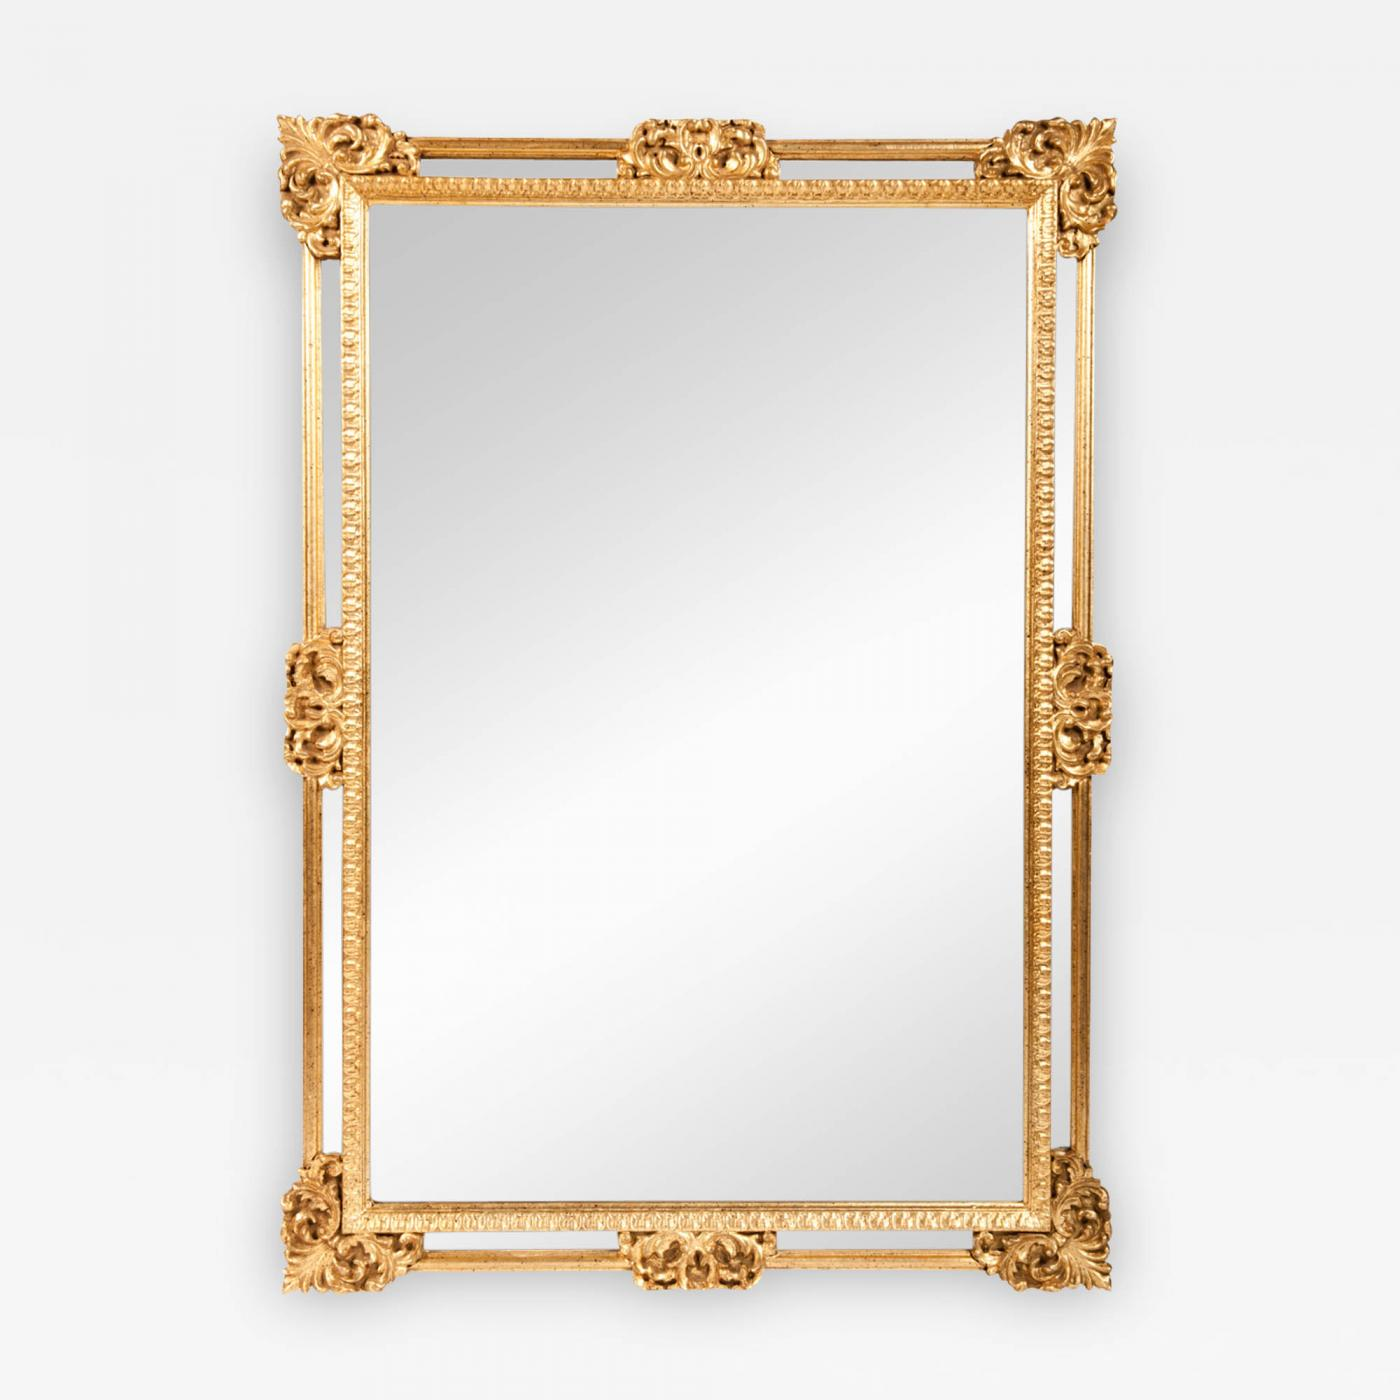 Vintage Ornately Carved Gilded Wood Frame Hanging Wall Mirror